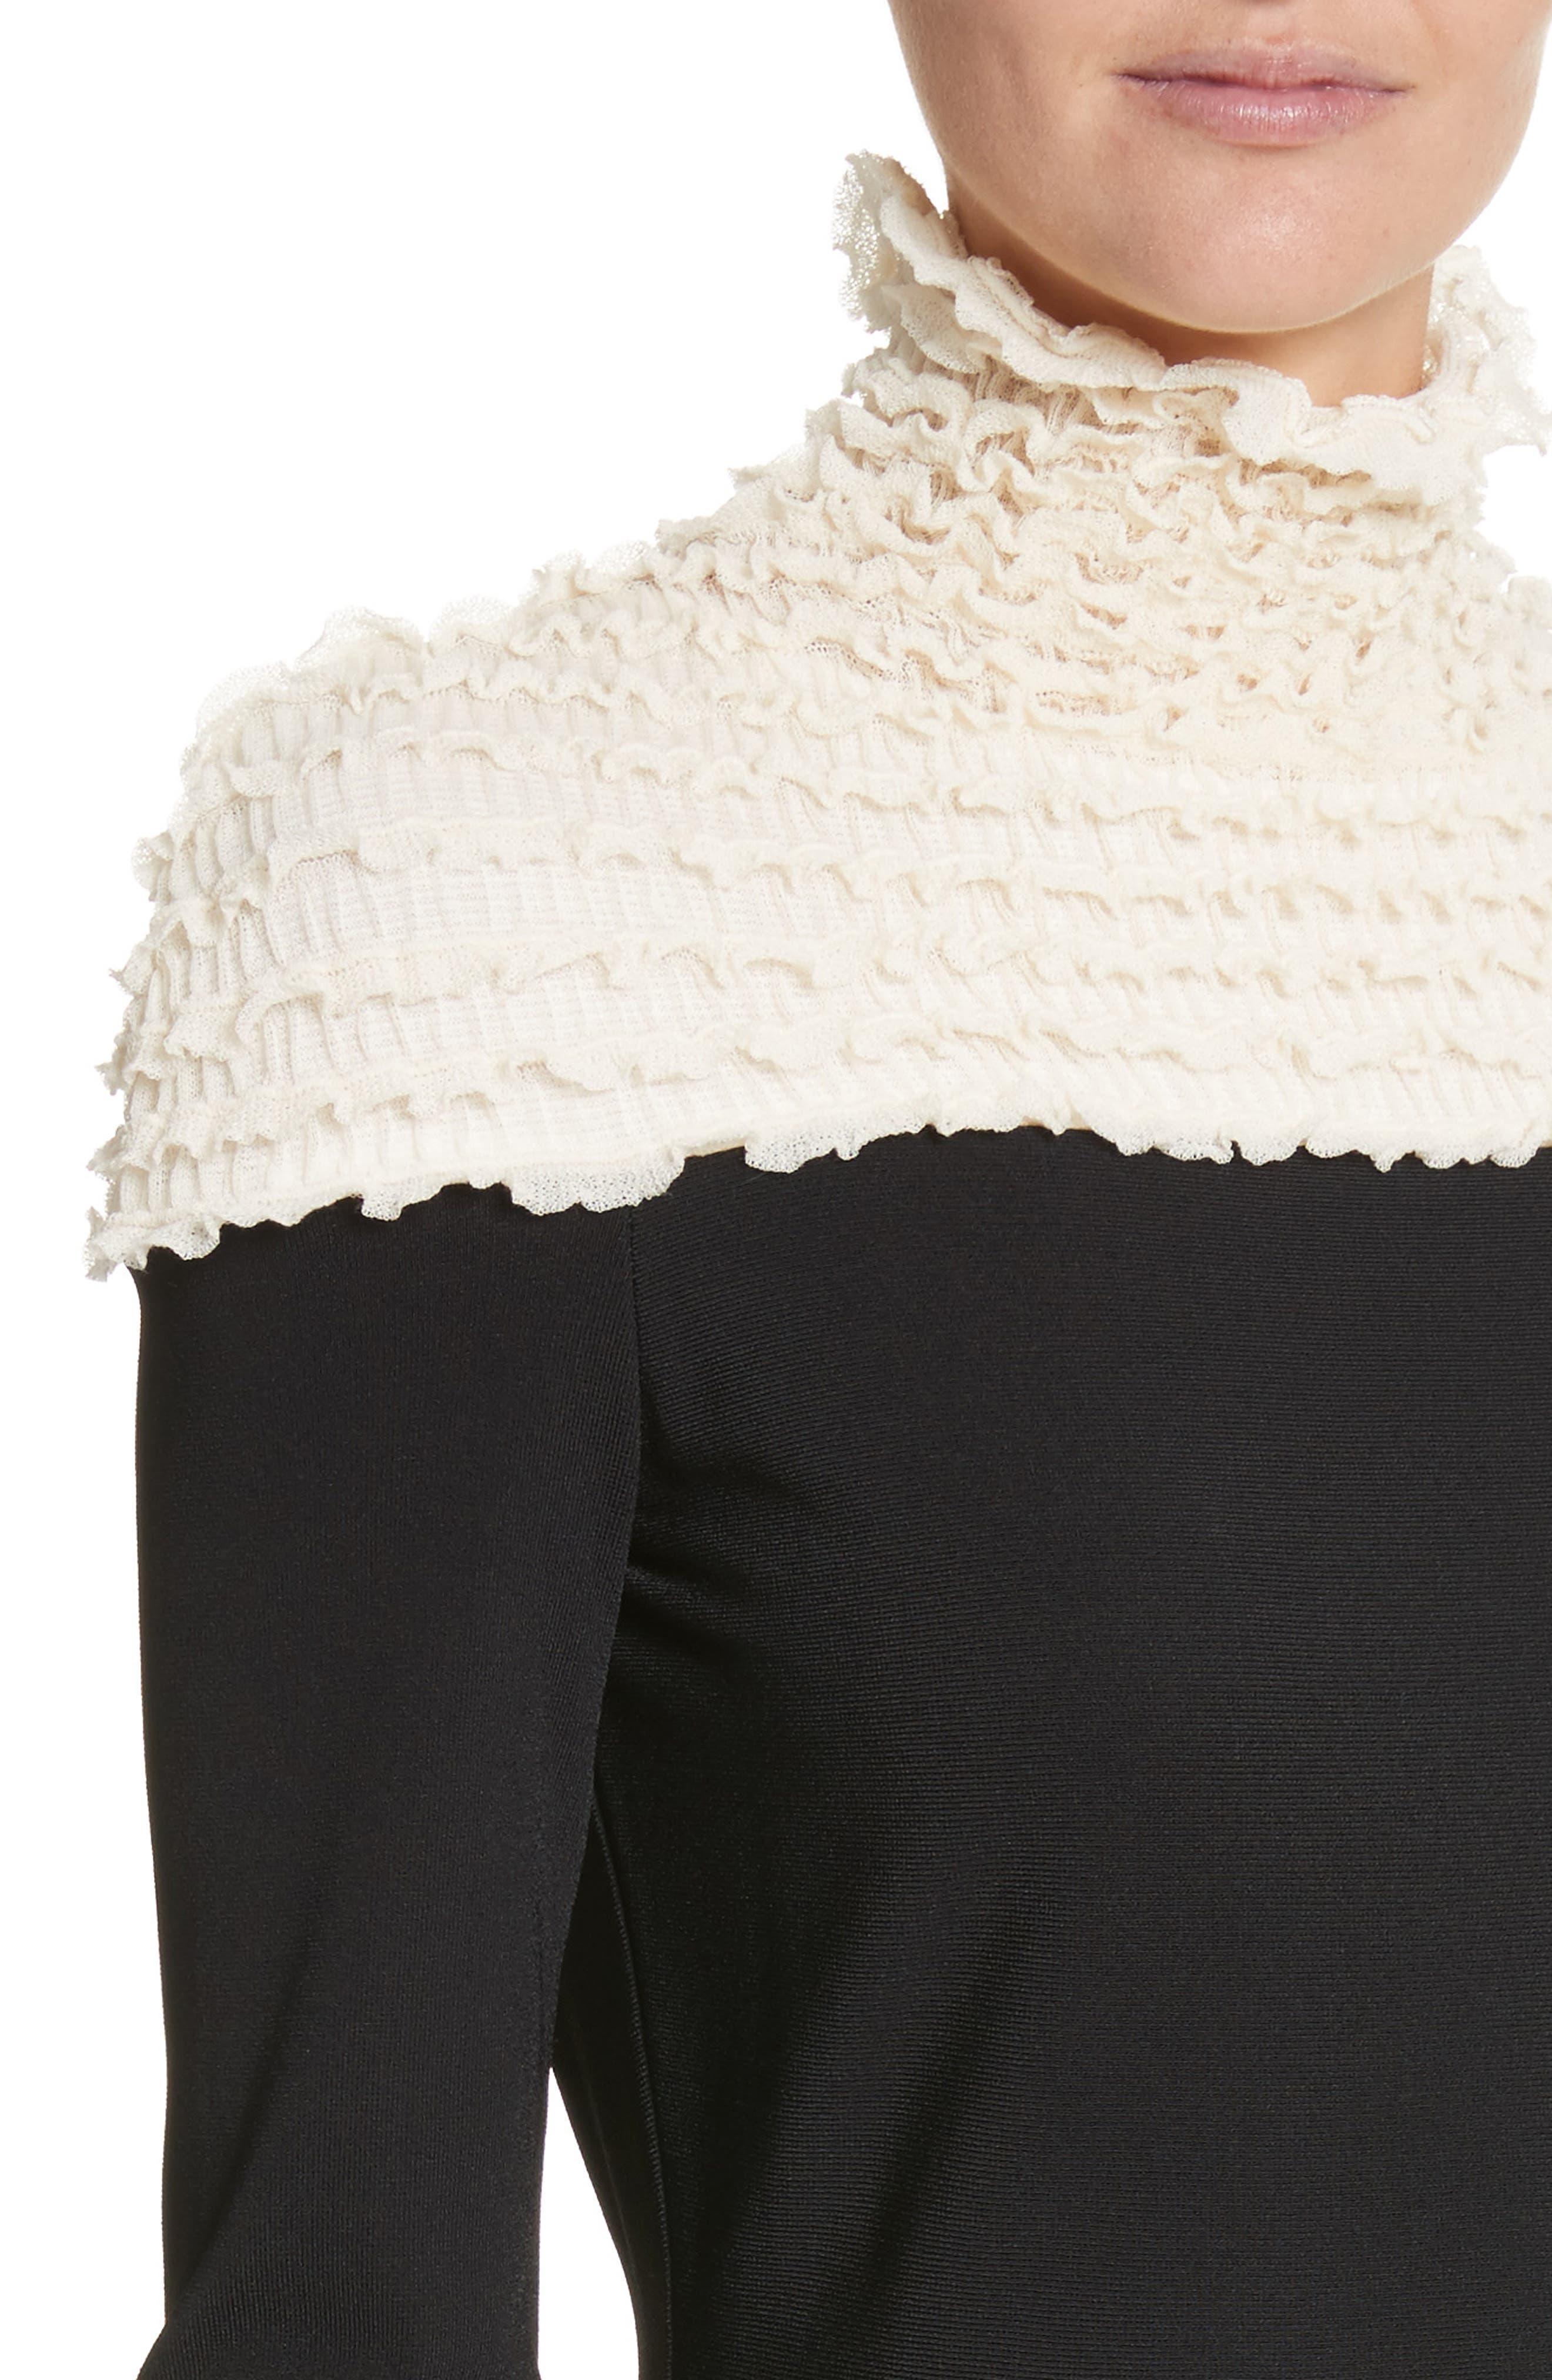 Ruffle Neckline Knit Dress,                             Alternate thumbnail 4, color,                             Black/ Ivory